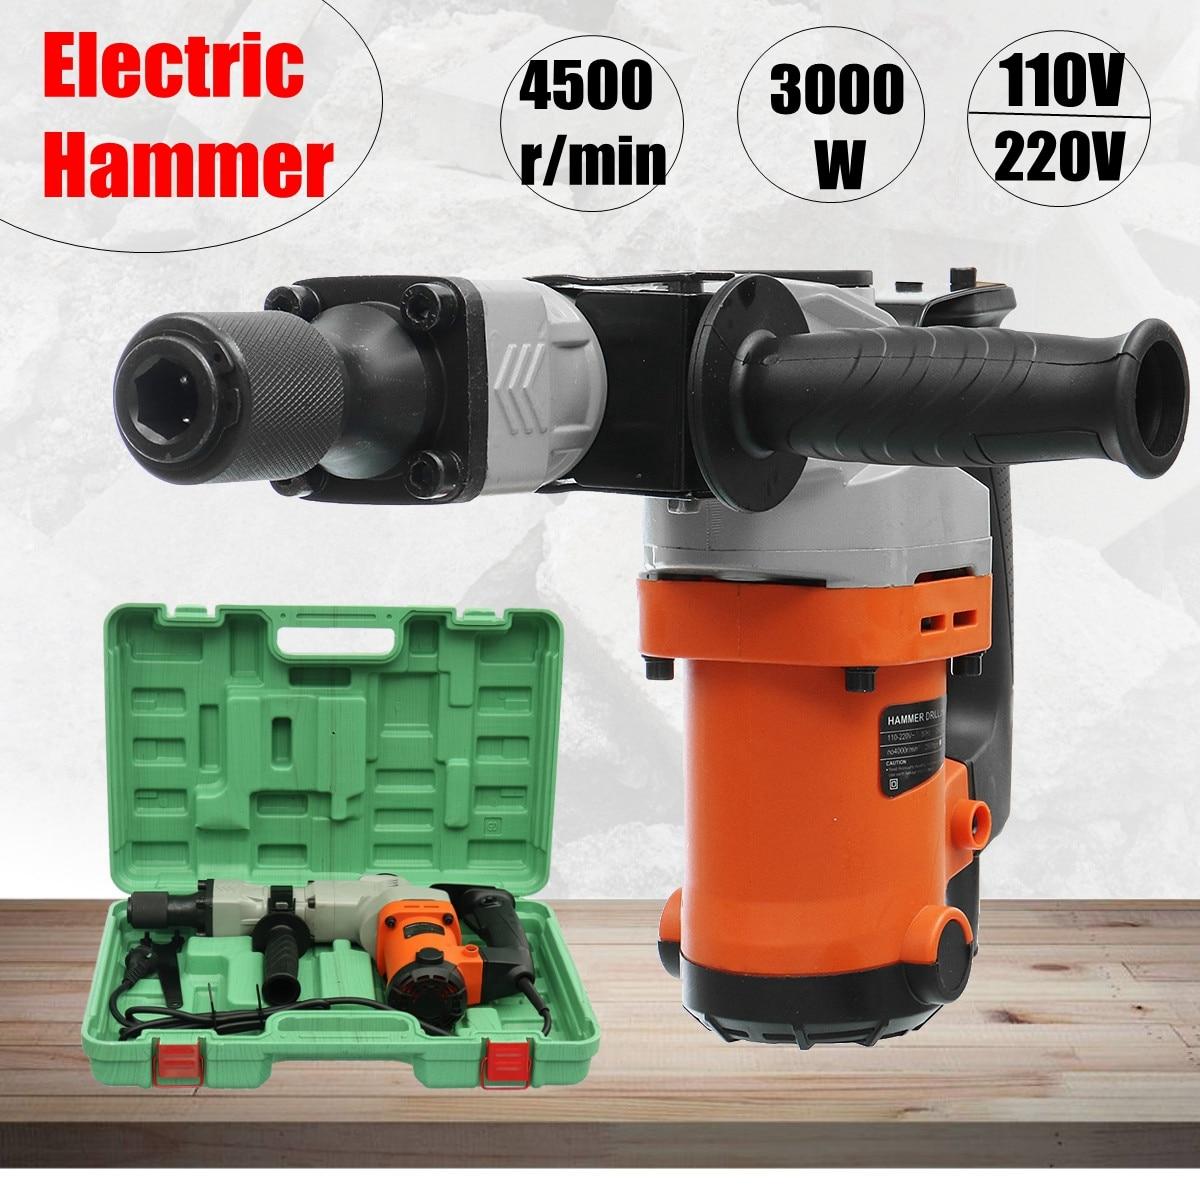 220V Electric Drills 3000W Electric Demolition Hammer Drill Concrete Breaker Punch Jackhammer 3000BPM220V Electric Drills 3000W Electric Demolition Hammer Drill Concrete Breaker Punch Jackhammer 3000BPM